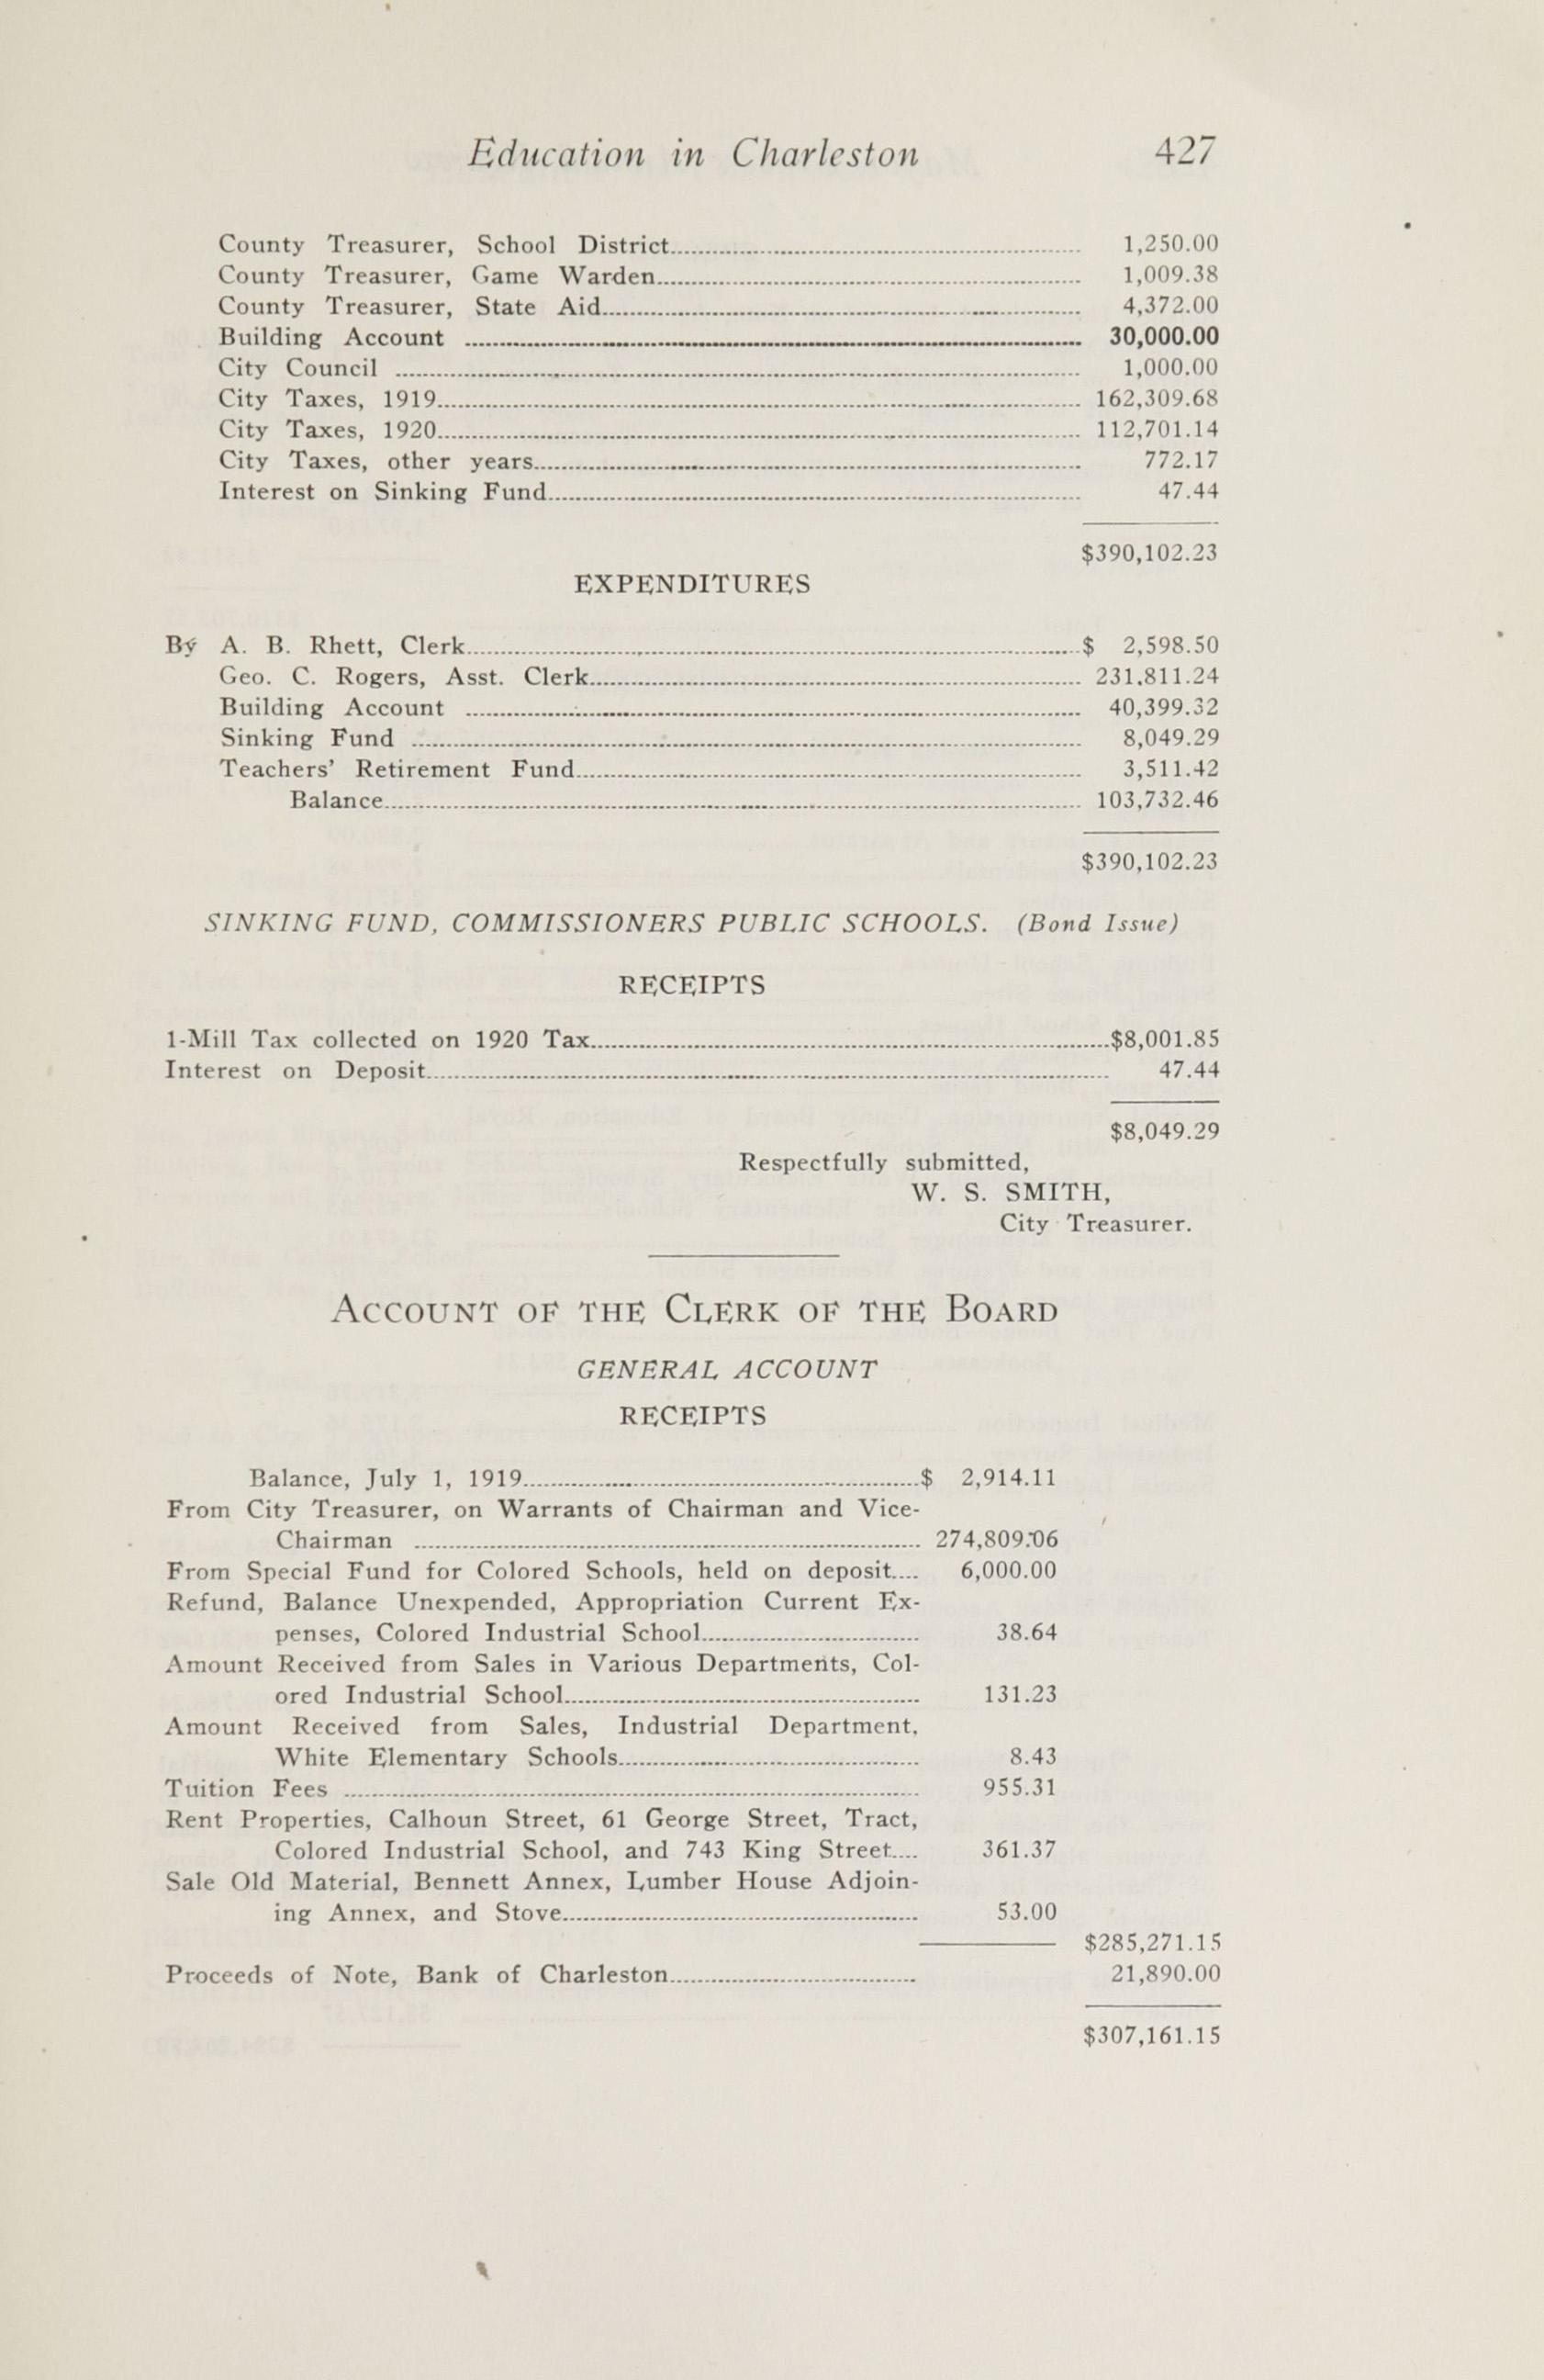 Charleston Yearbook, 1920, page 427